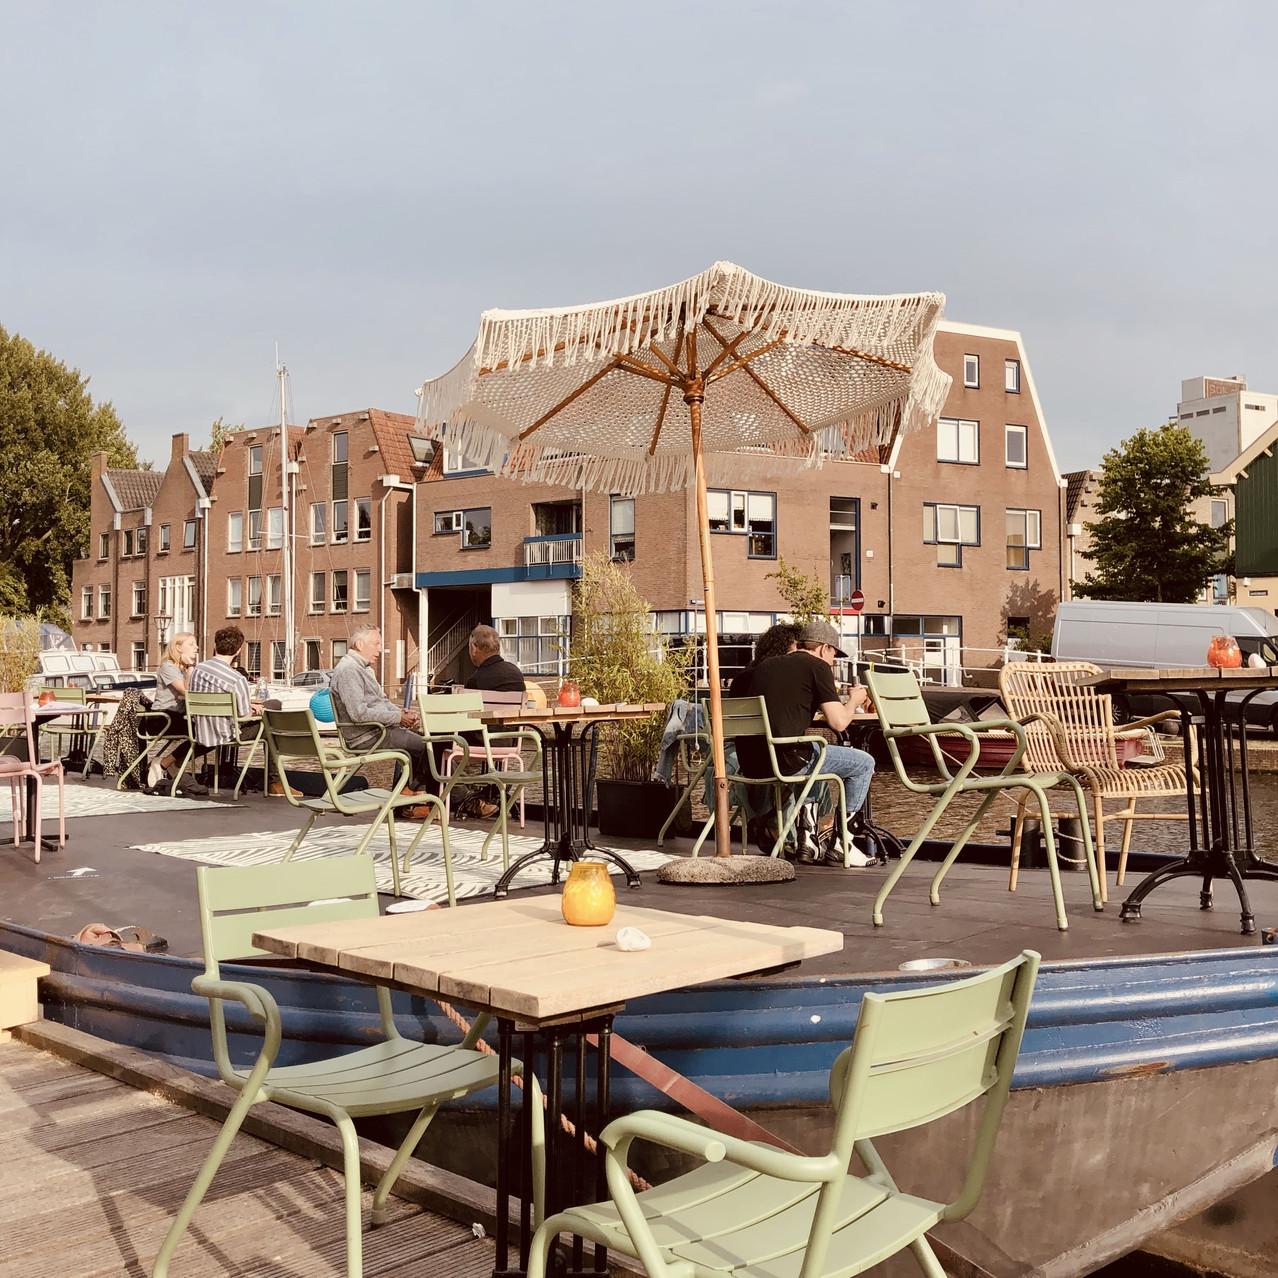 Restaurant Lot & de Walvis outdoor terrace Leiden Netherlands